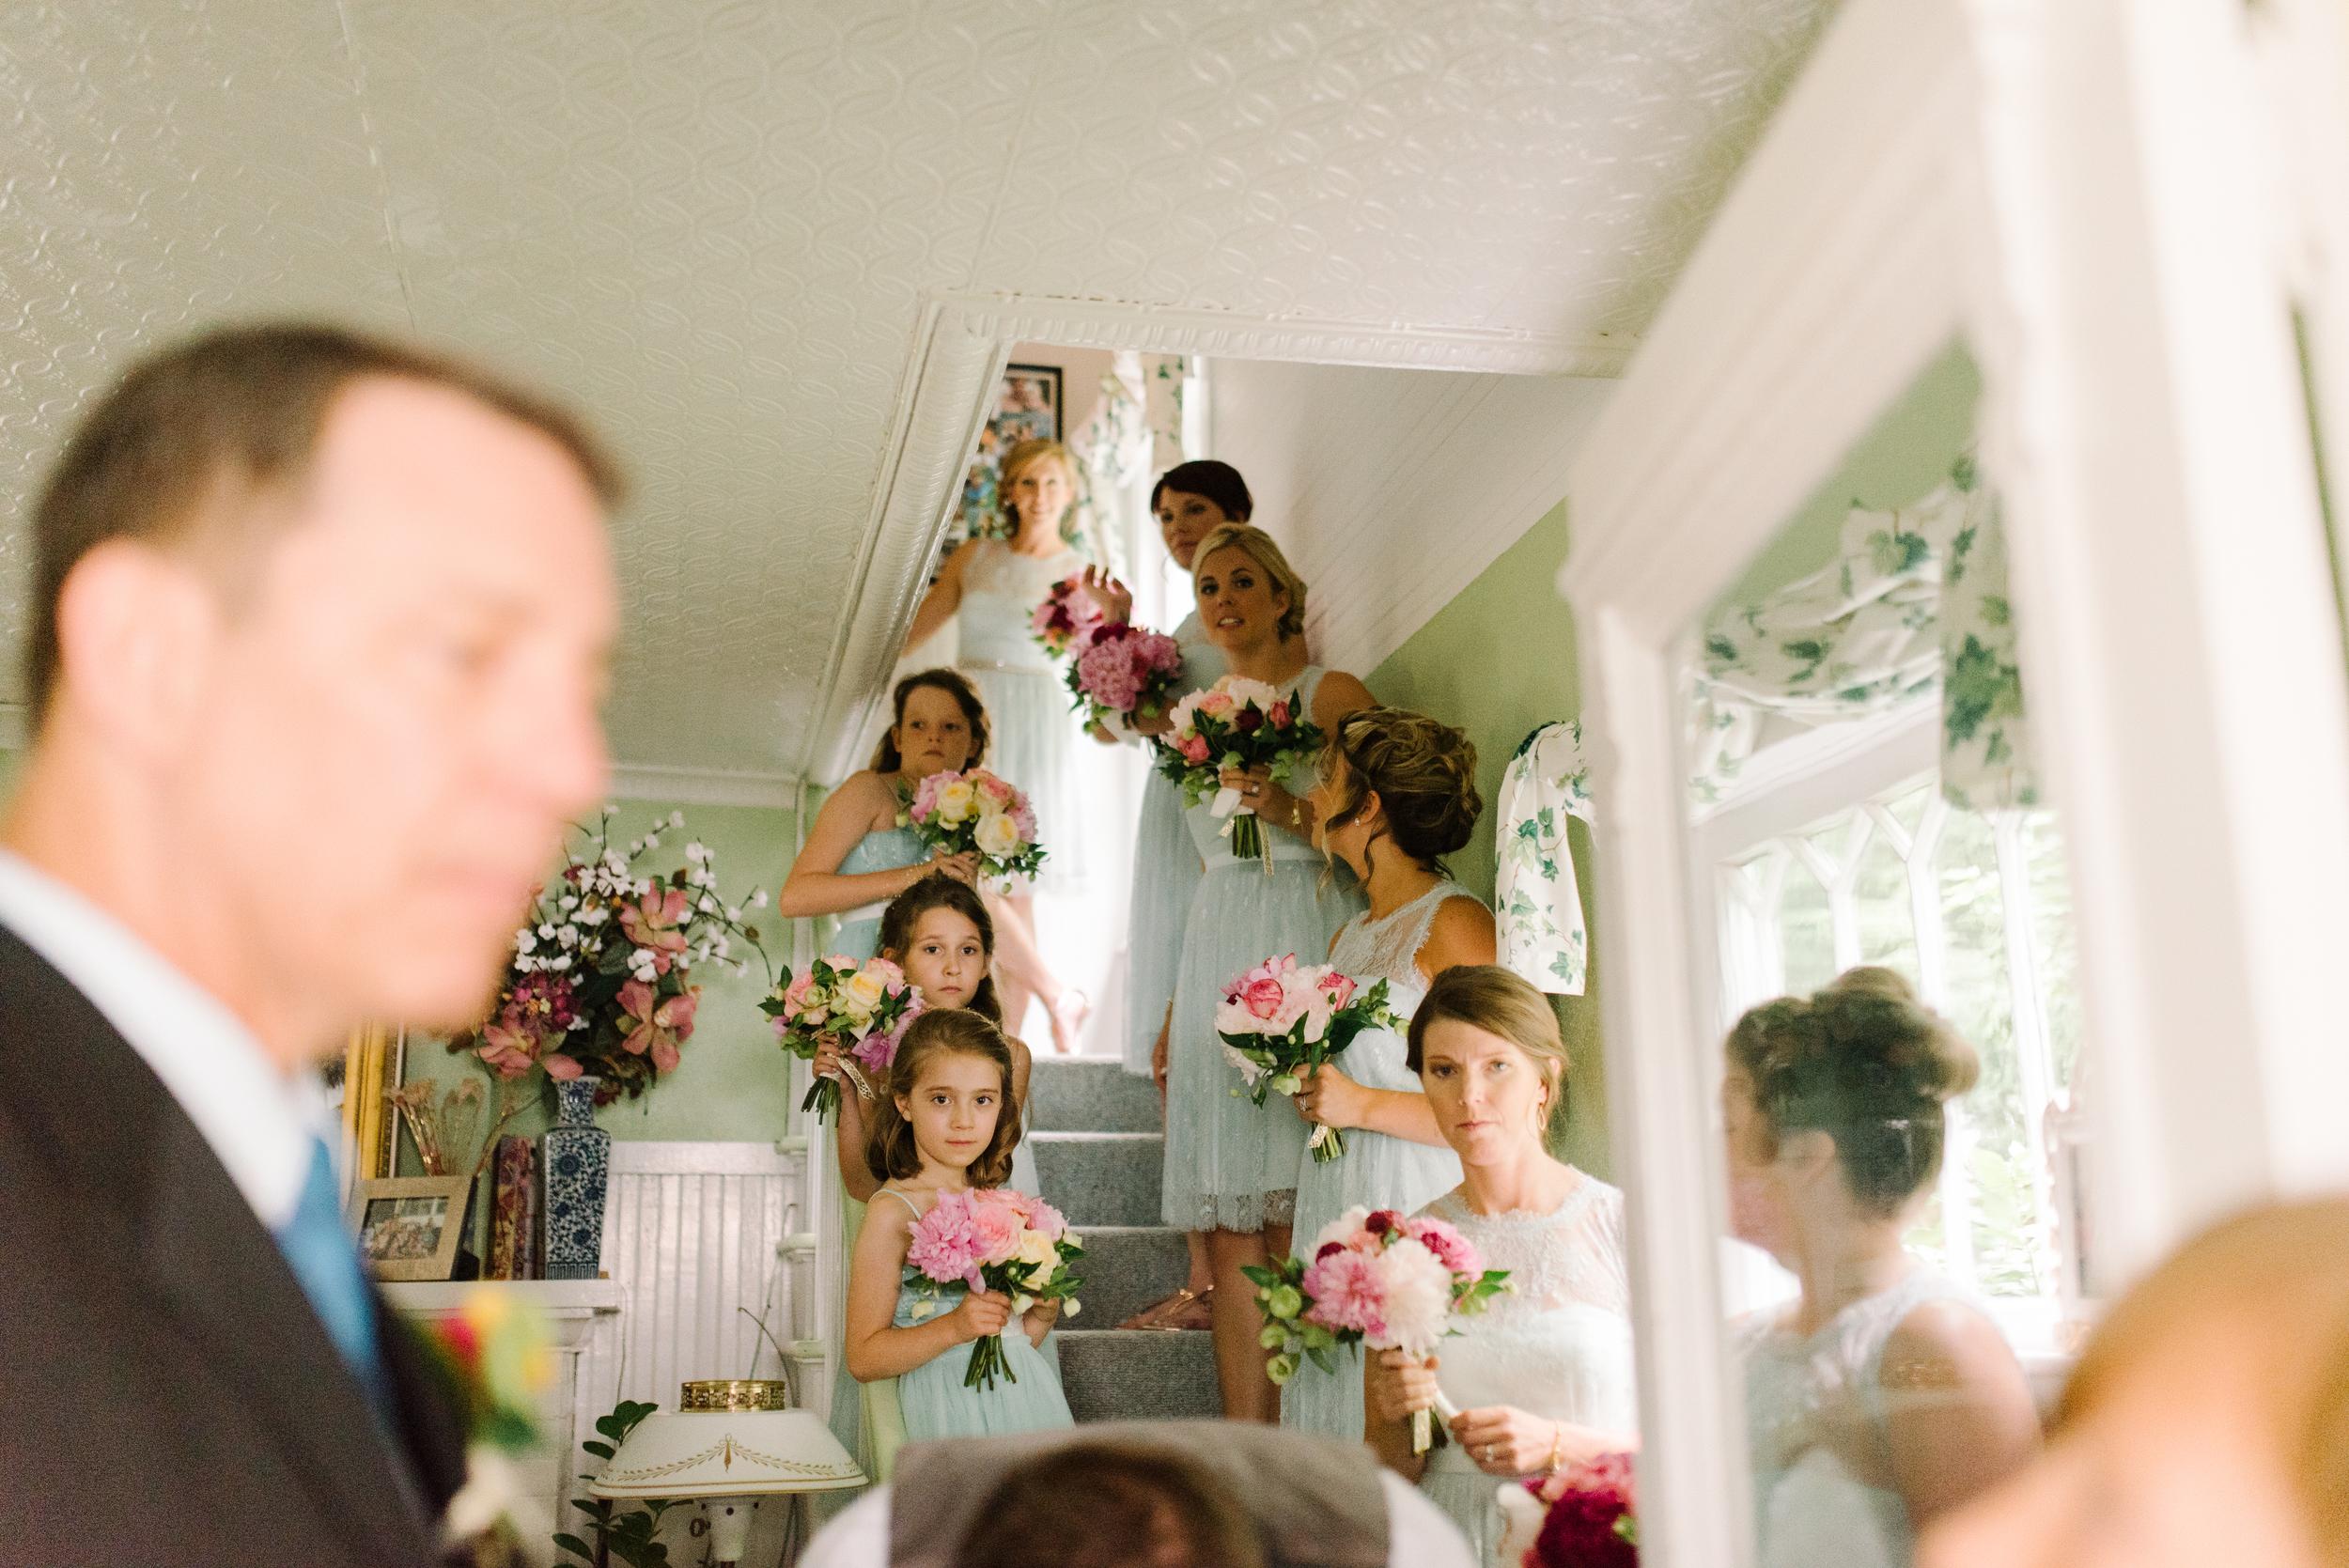 Wedding-21 copy.JPG